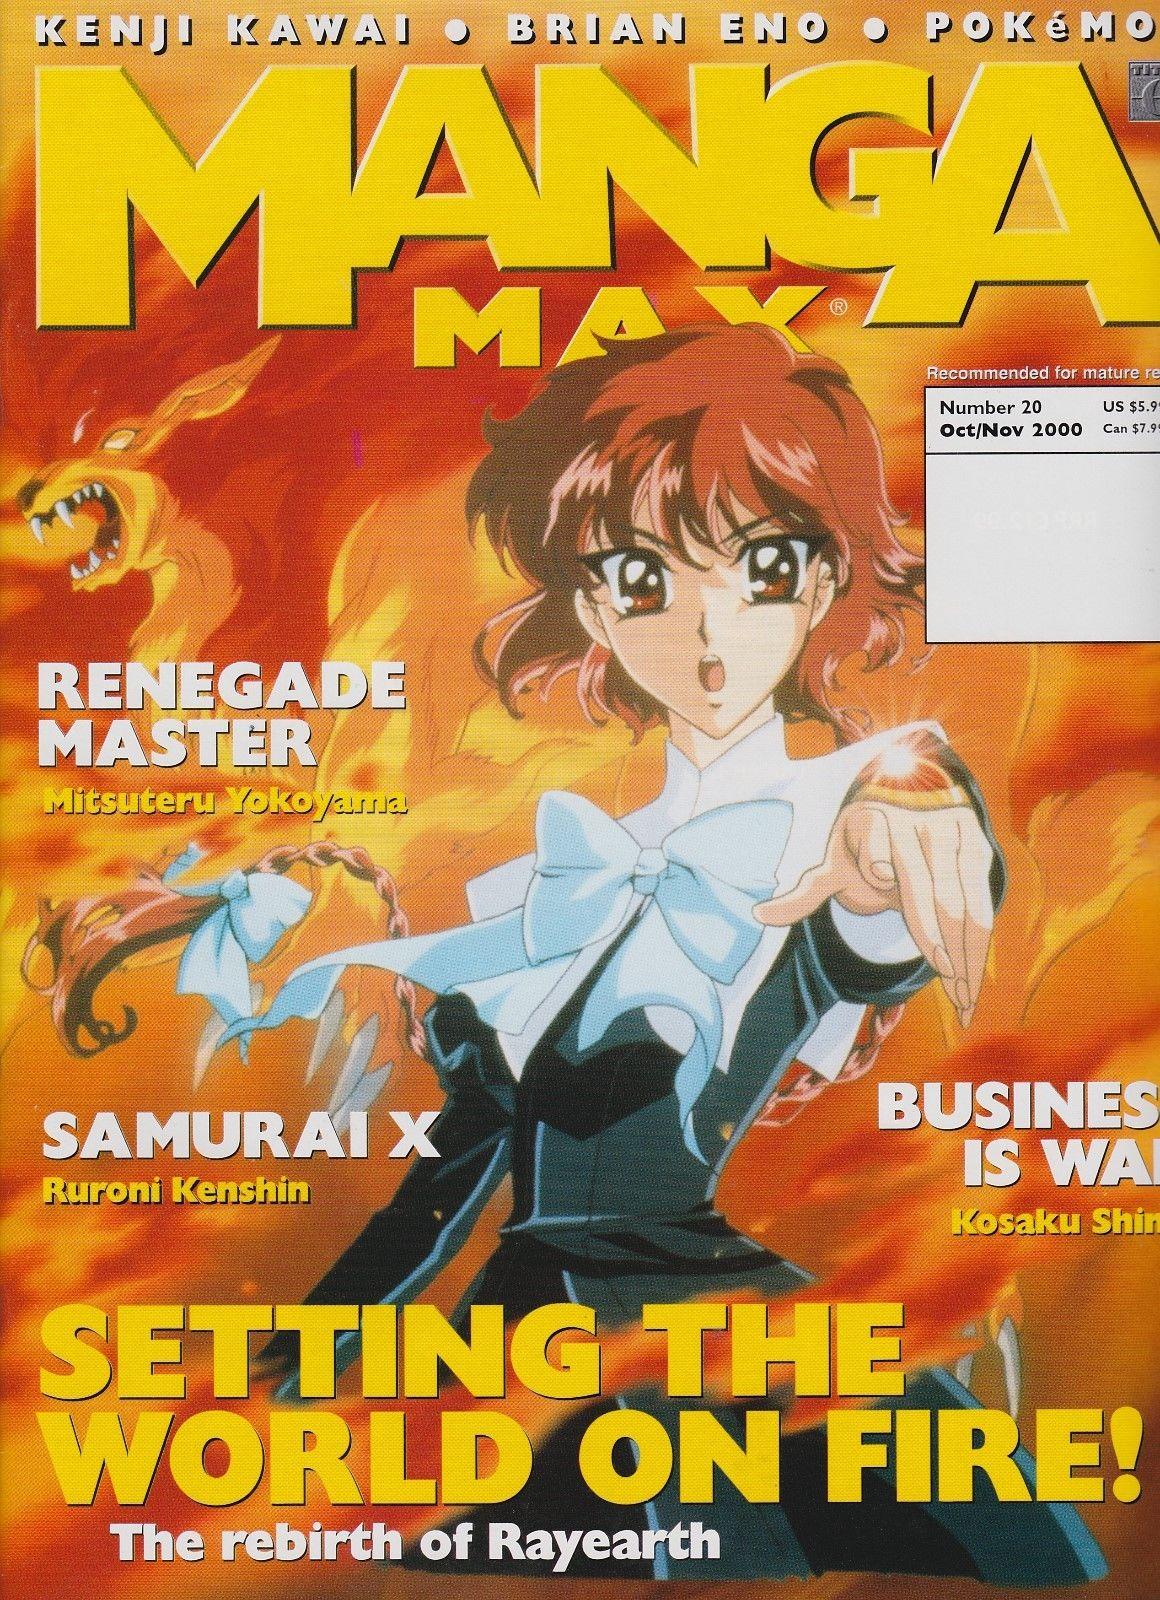 Manga Max Magazine 20 2000 10 11 October November Anime Excellent Condition Hipcomic